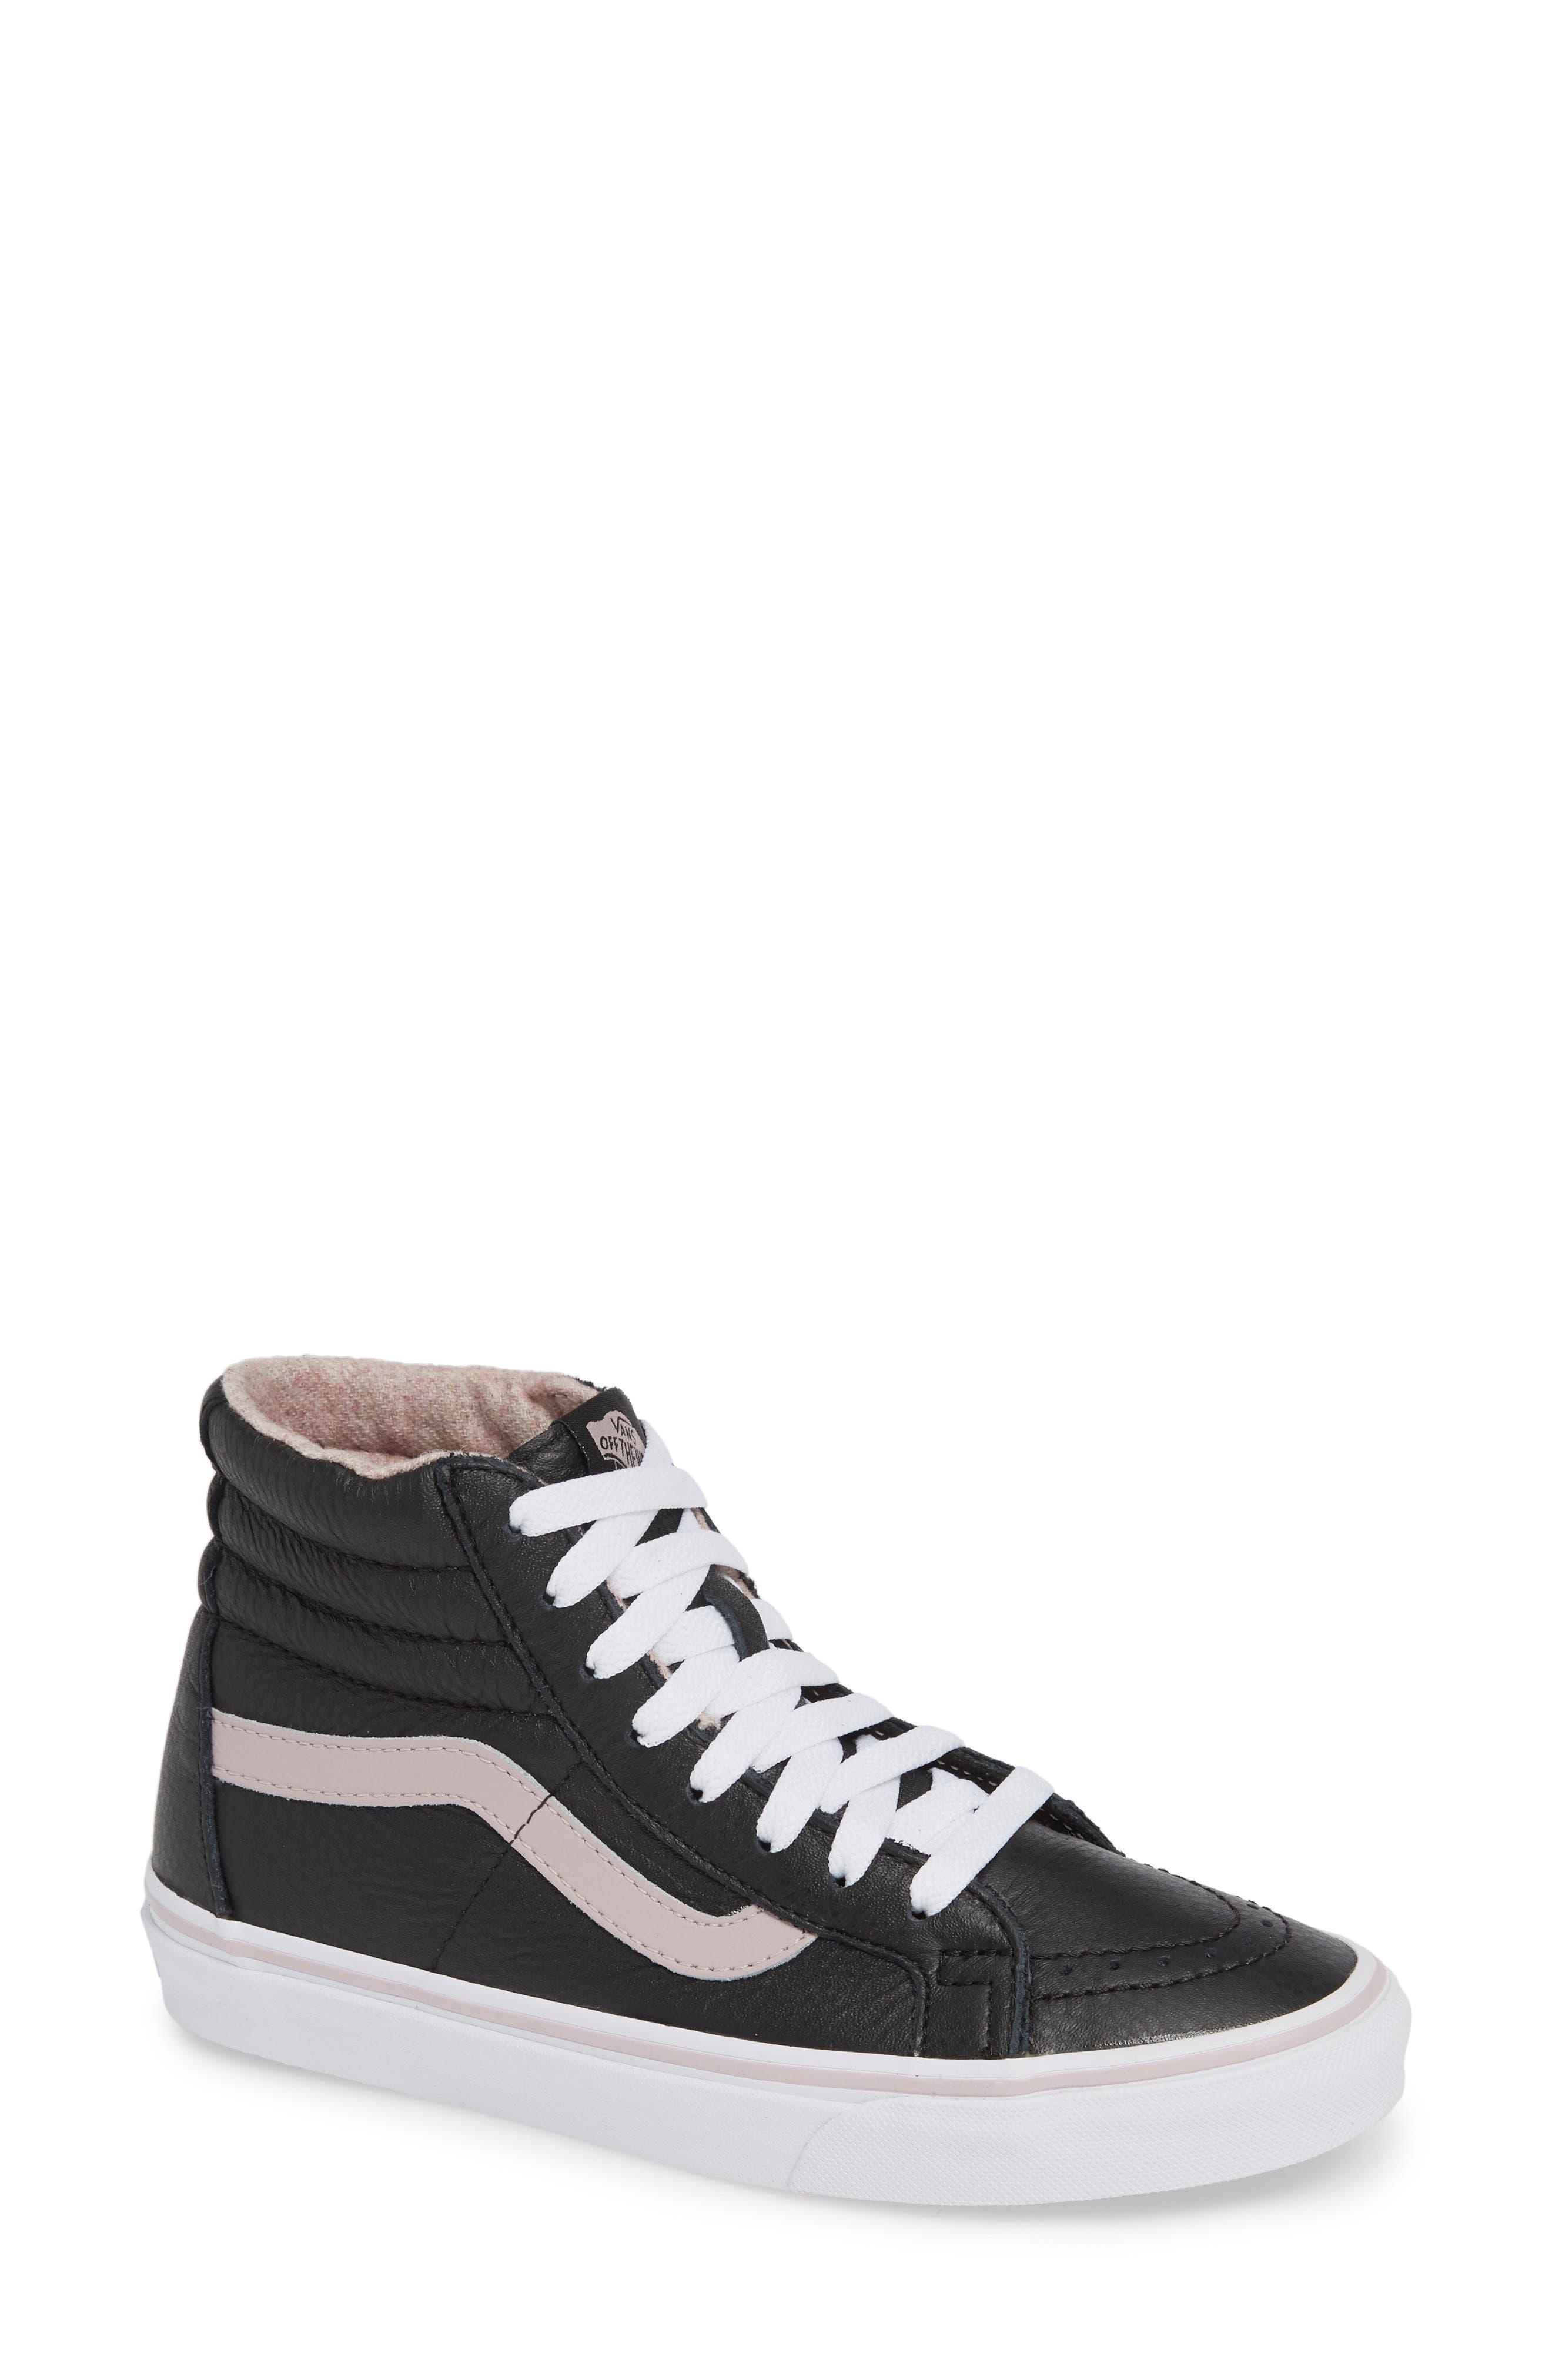 VANS Sk8-Hi Reissue Sneaker, Main, color, 001